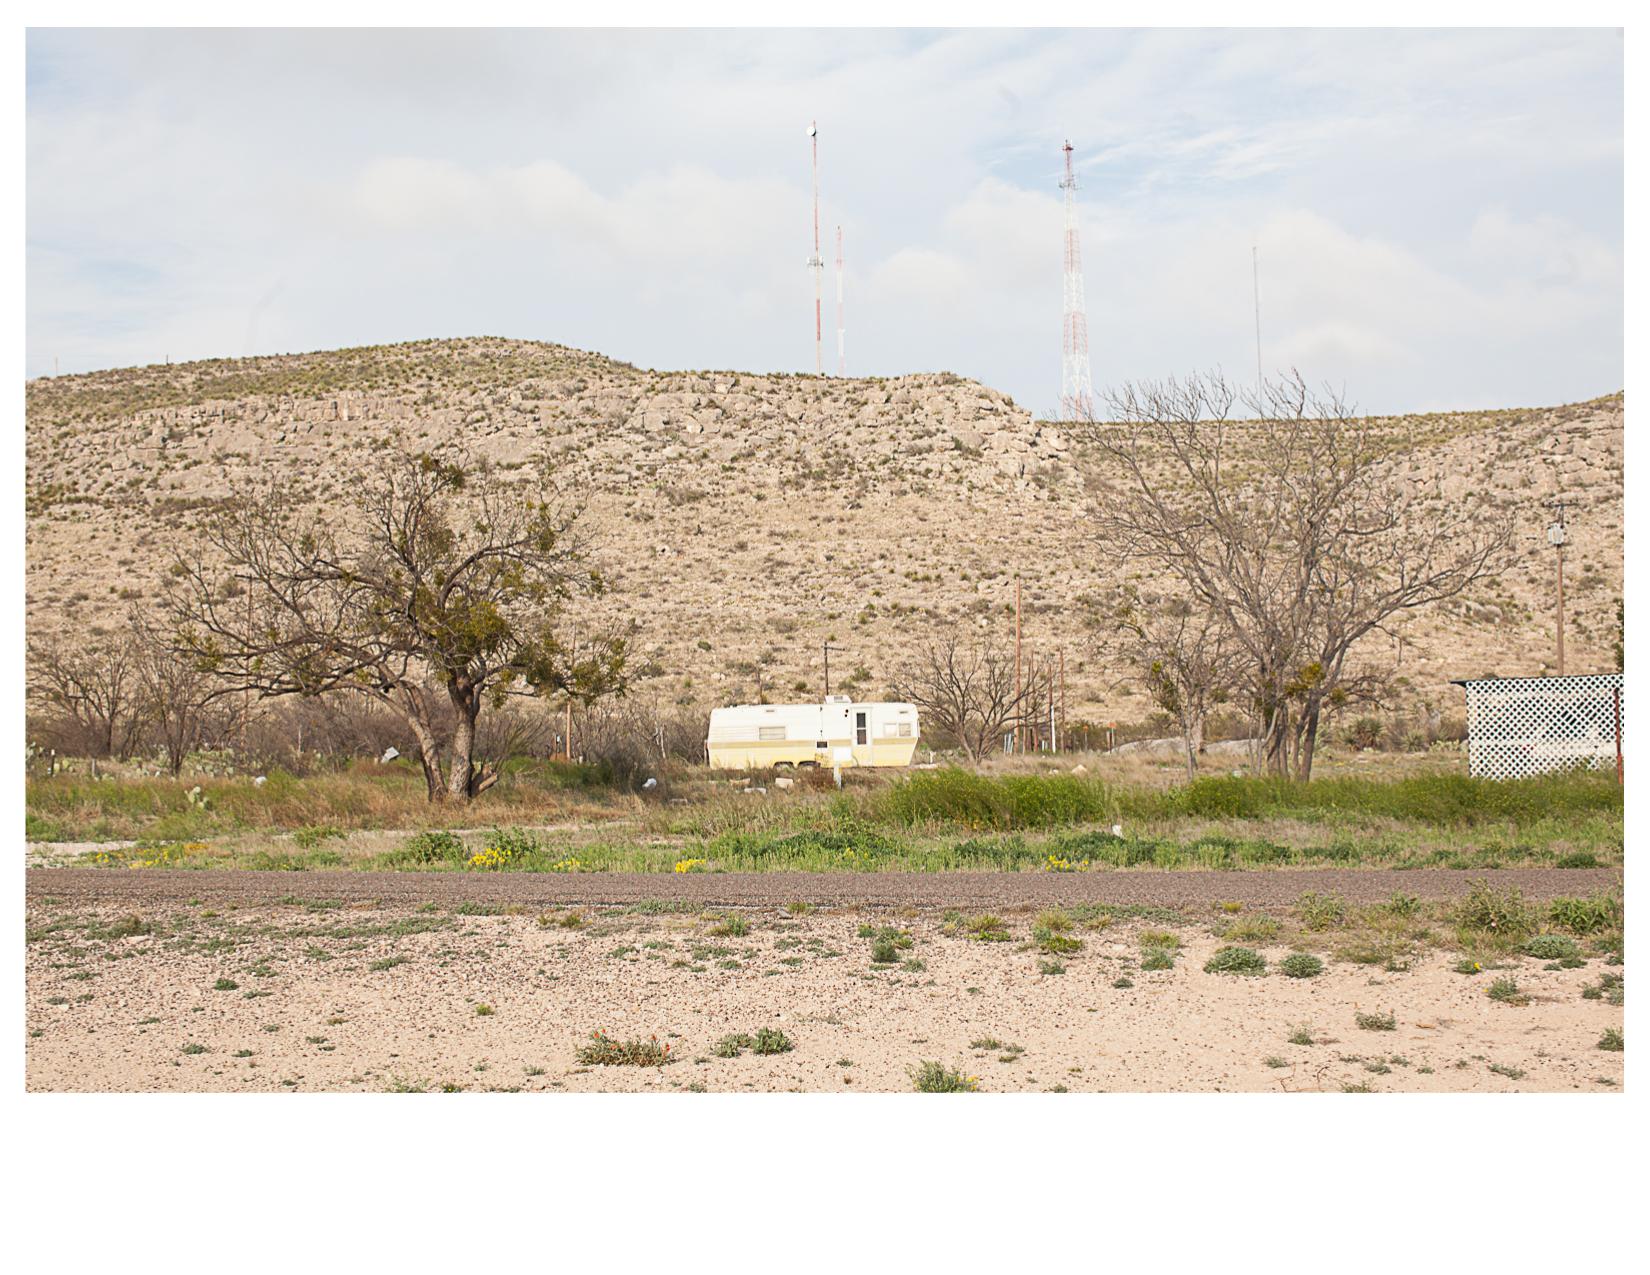 Trailer and Antennas, Sanderson, TX